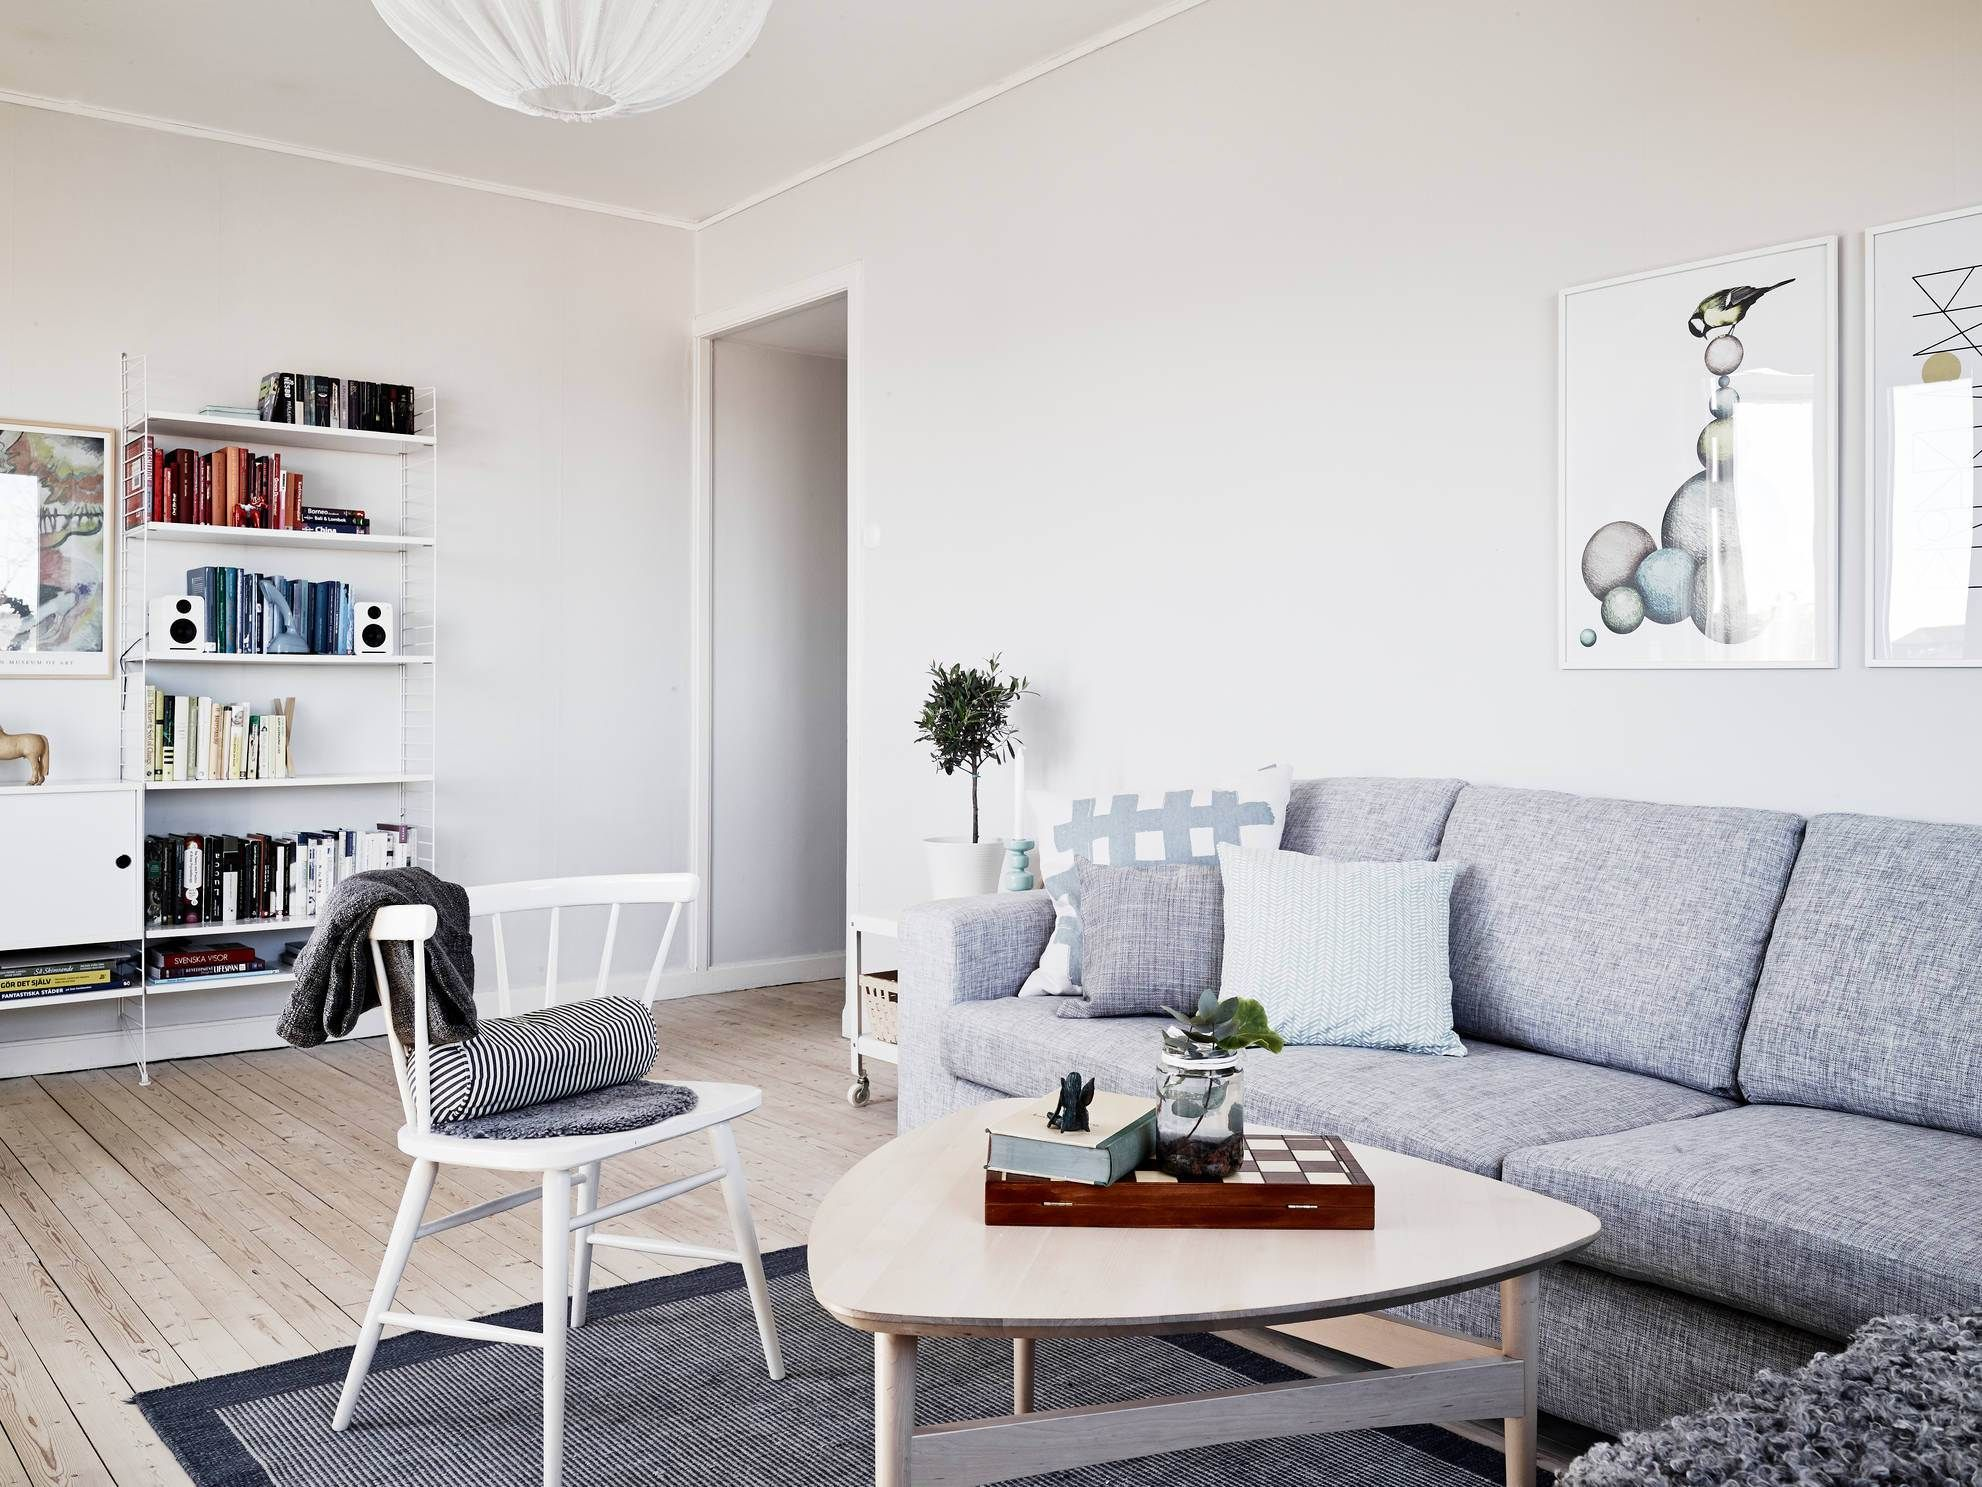 Ikea muebles blancos uac hacer armario bb hemnes vitrina cajones tinte blanco ikea mueble de - Ikea muebles blancos ...